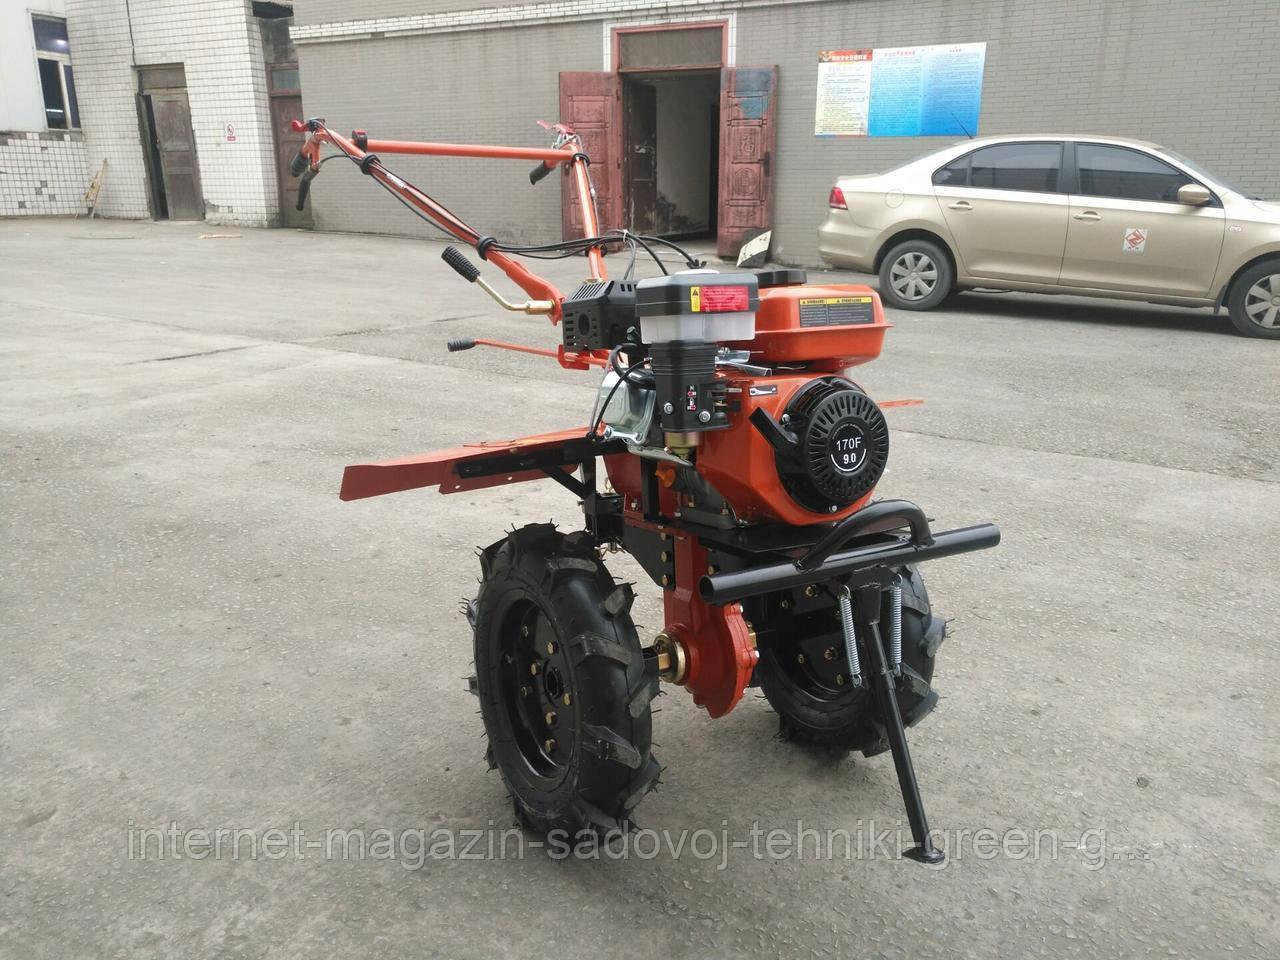 Мотоблок бензиновый Tata ТТ 1100D-ZX (9 л. с., WM177F, фреза в к-те) оригинал